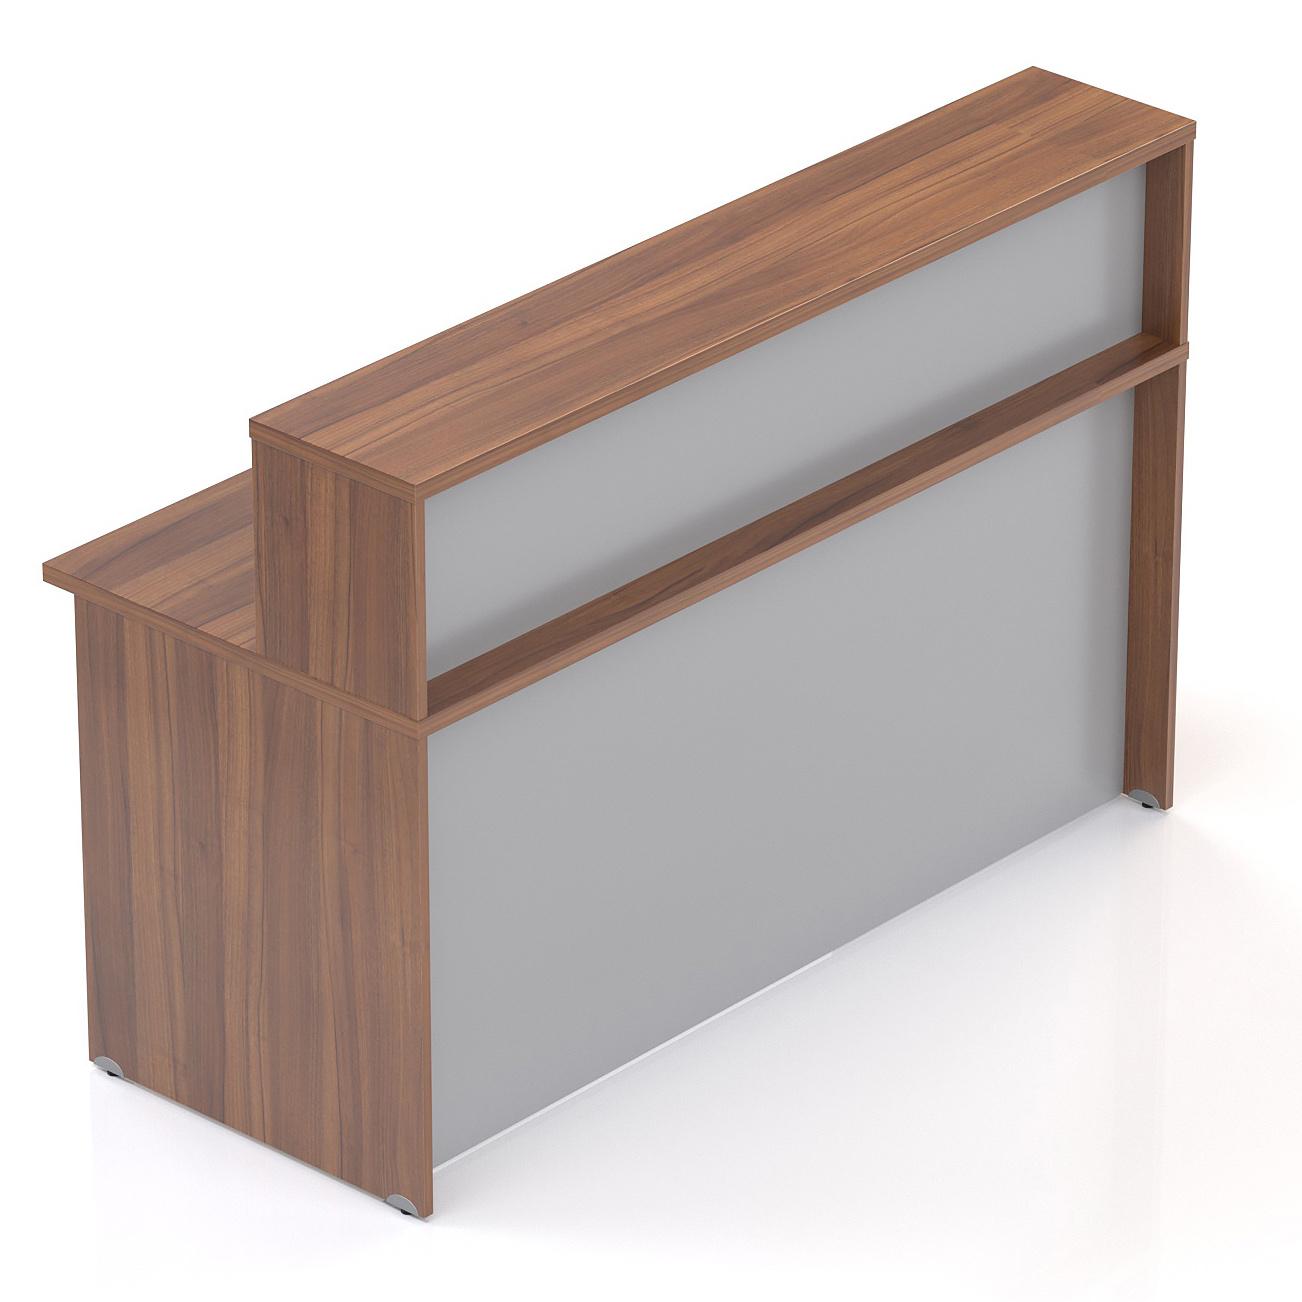 Recepčný pult s nadstavbou Komfort, 160x70x111 cm - NLKA16 19